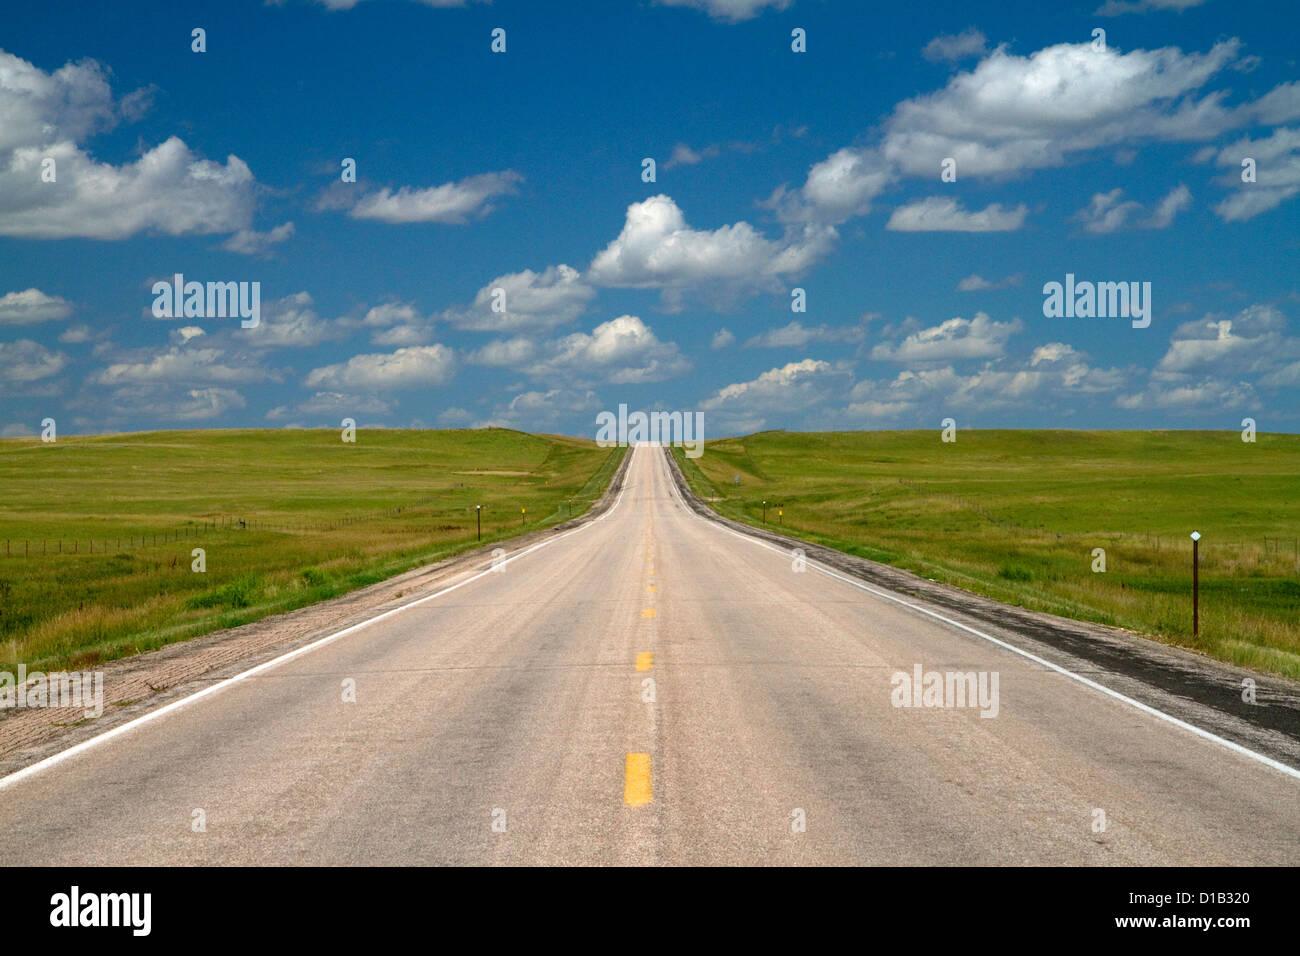 Highway 85 north of Spearfish, South Dakota, USA. - Stock Image